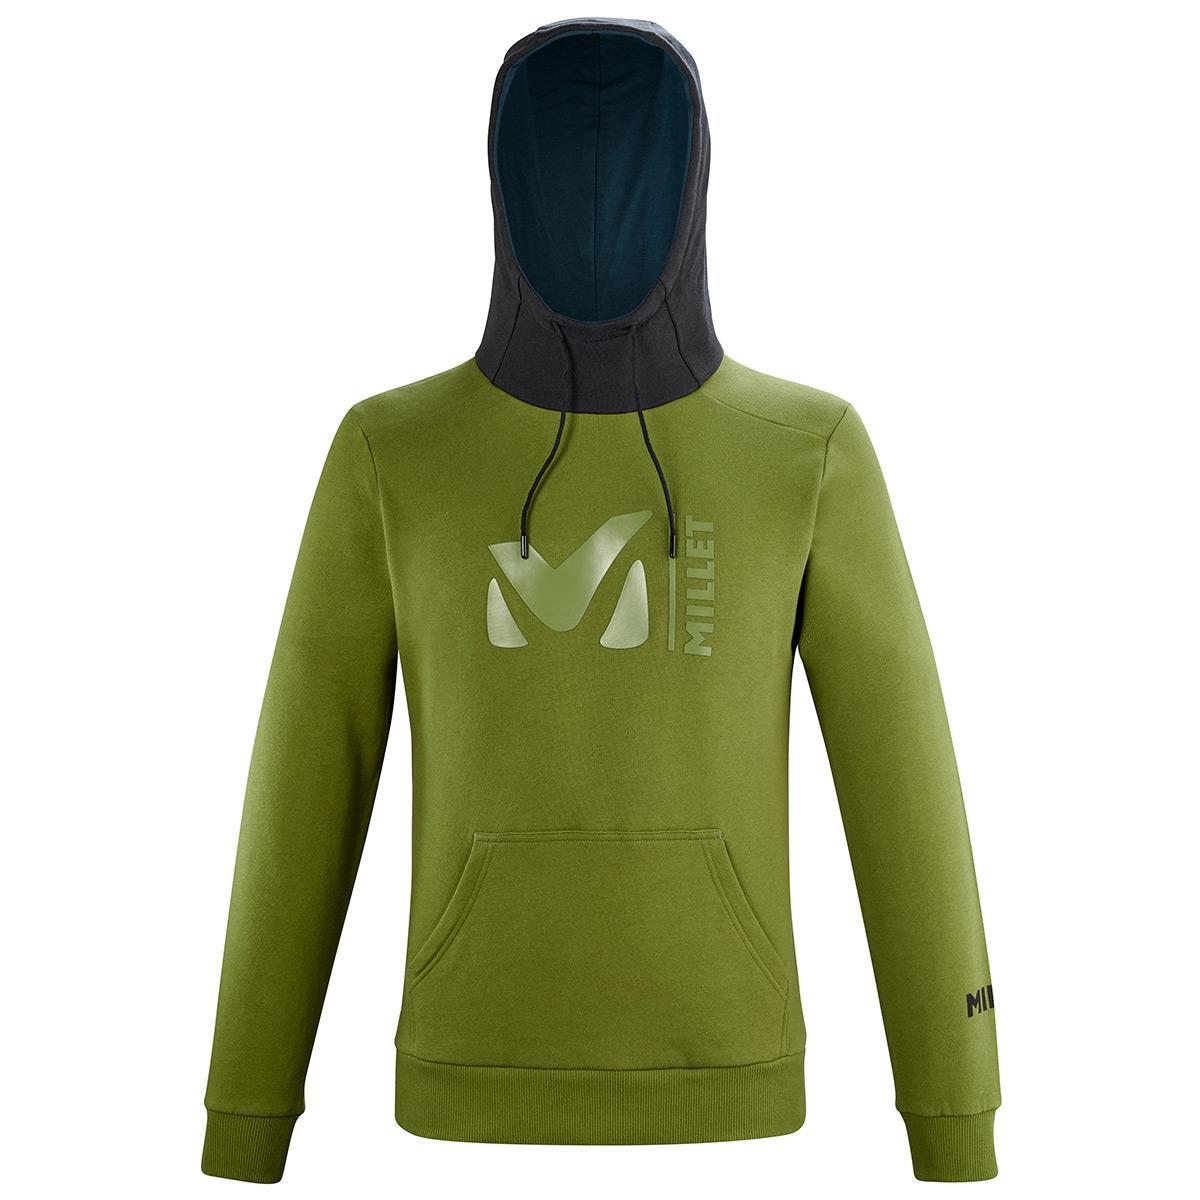 Millet MIL SWEAT FD Erkek Swetshirt MIV8870 9453